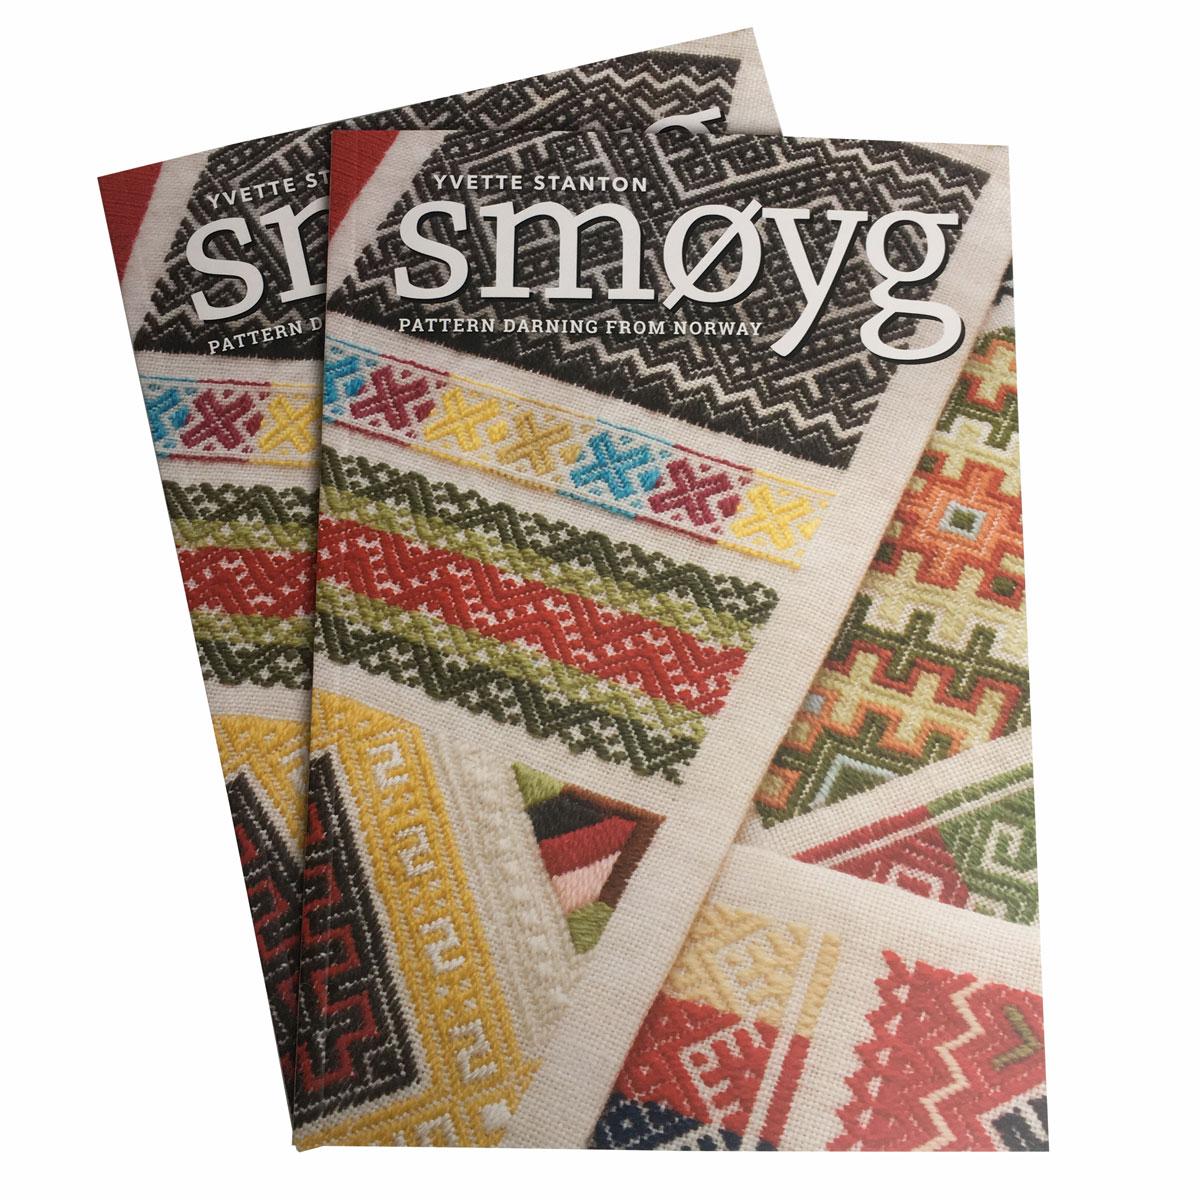 Smøyg: Pattern Darning from Norway